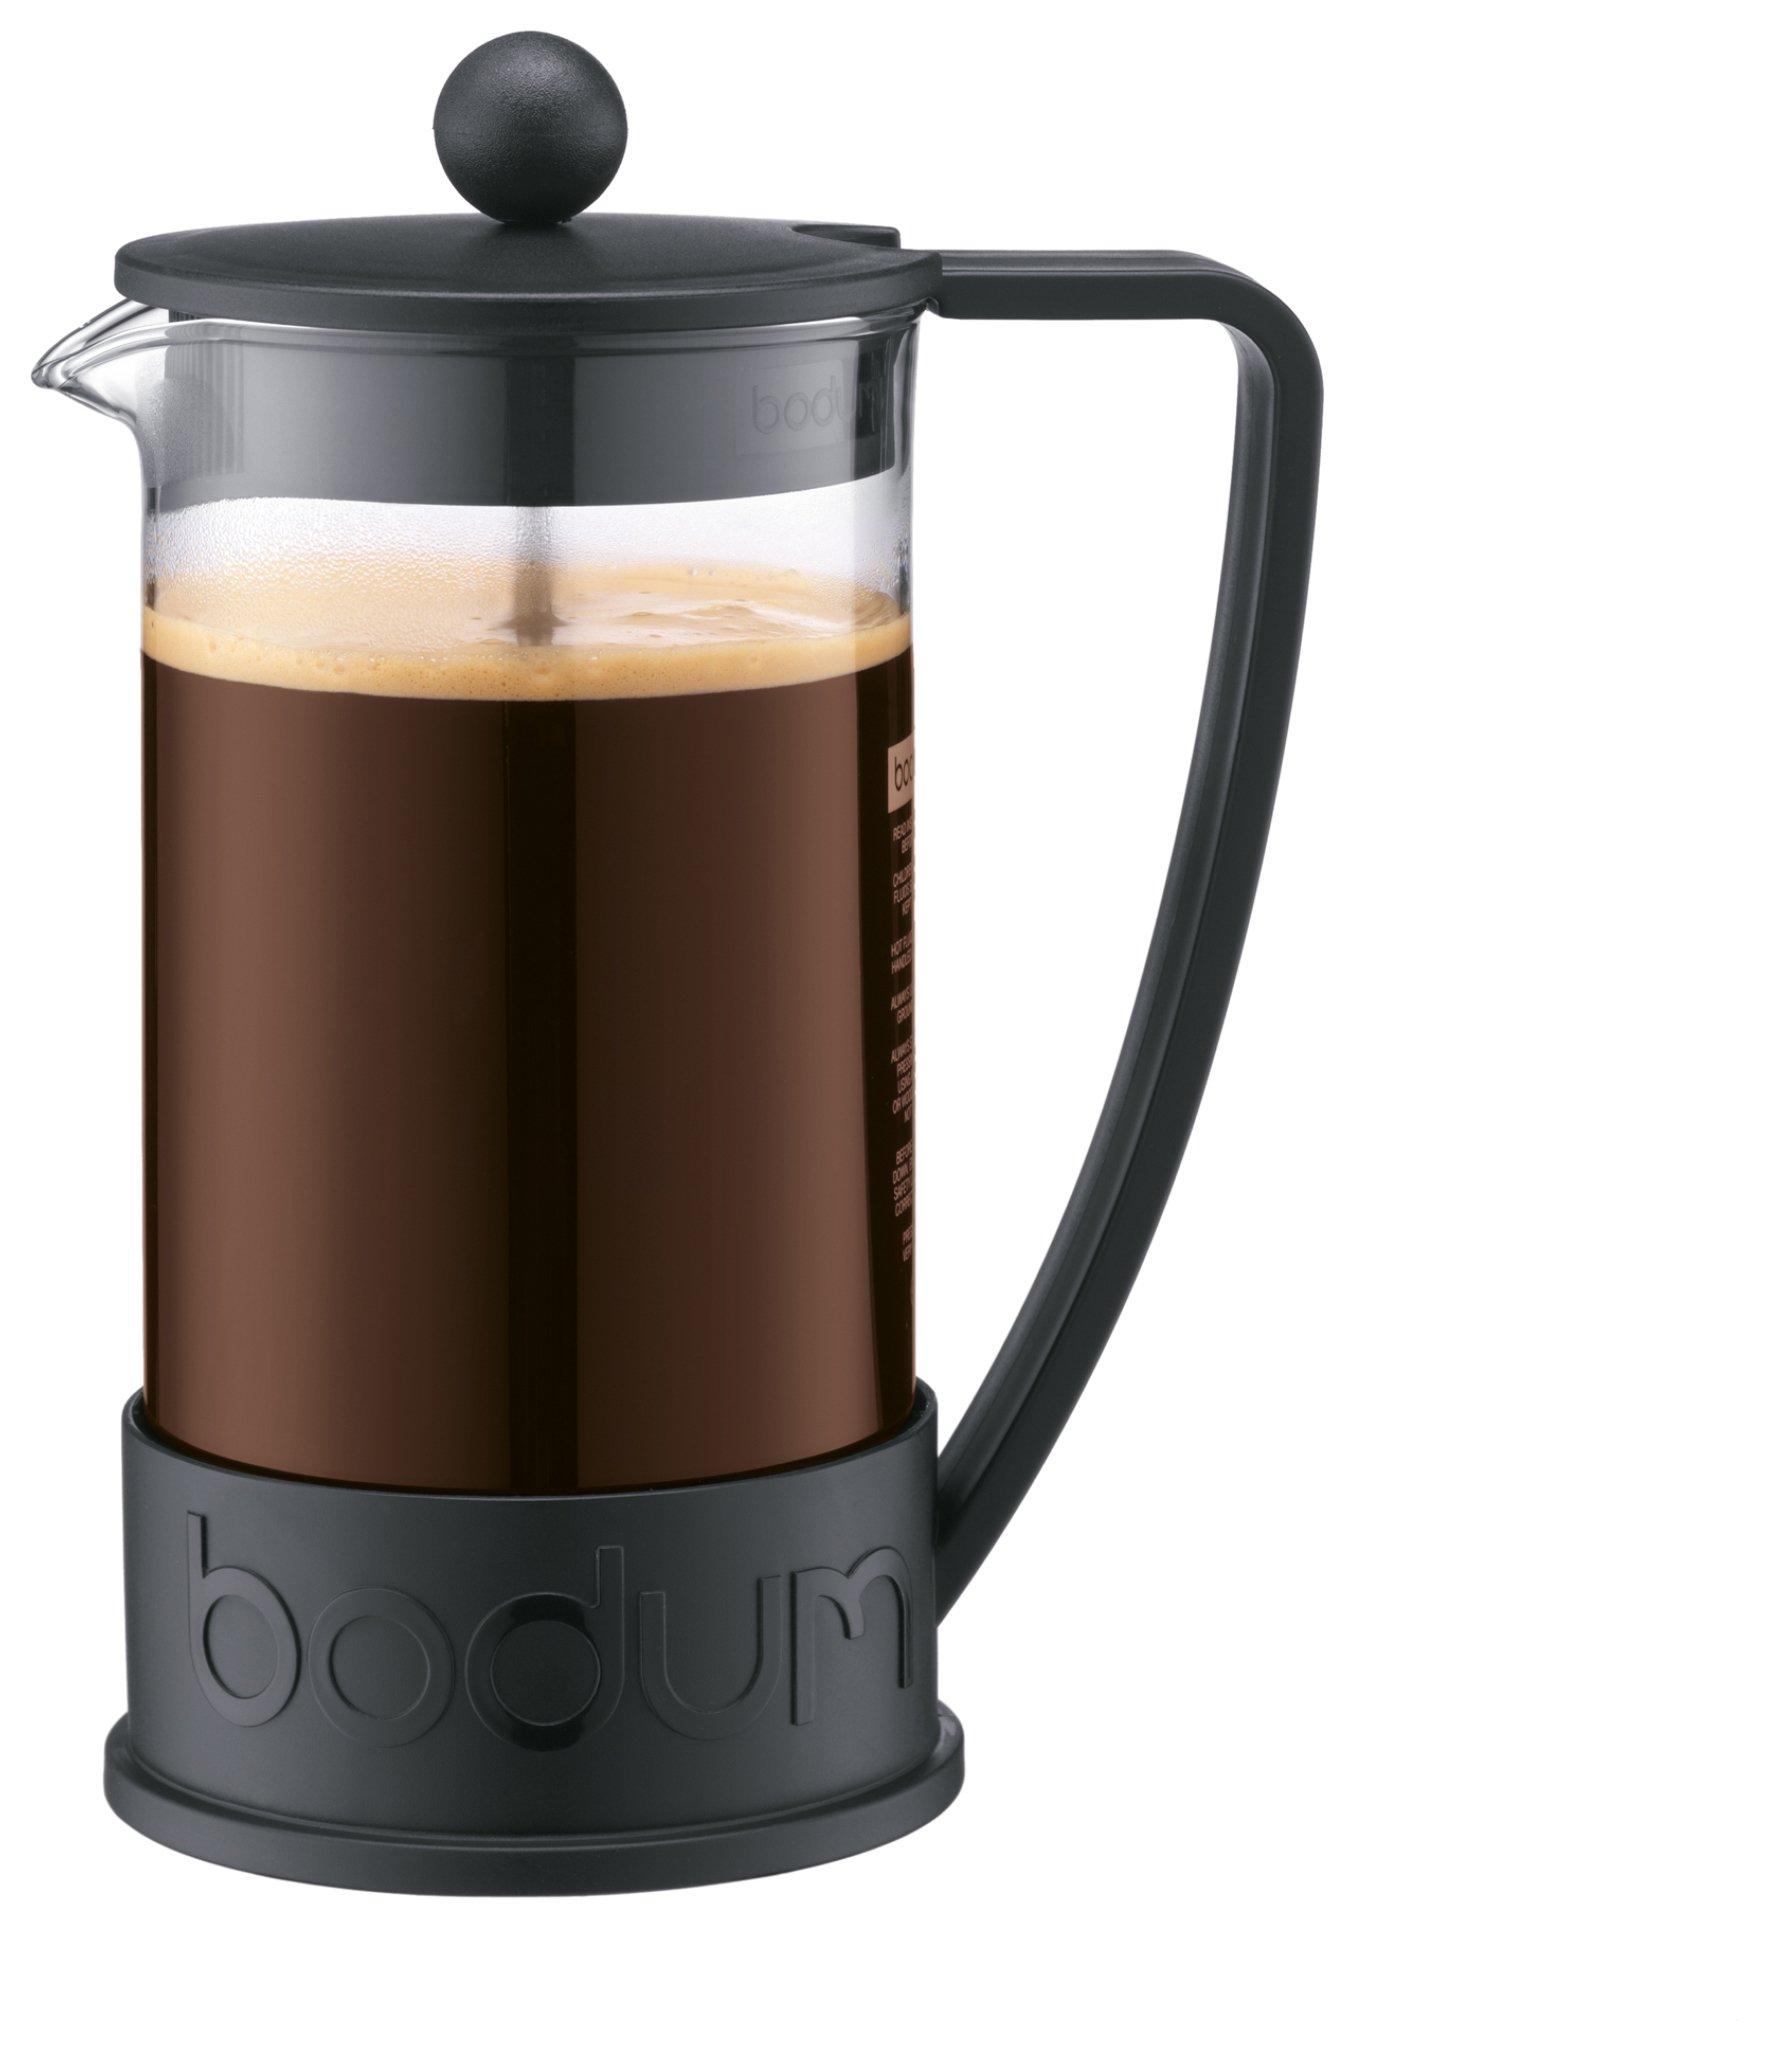 Image of Bodum - Brazil 8 Cup 1 Litre Coffee Maker - Black